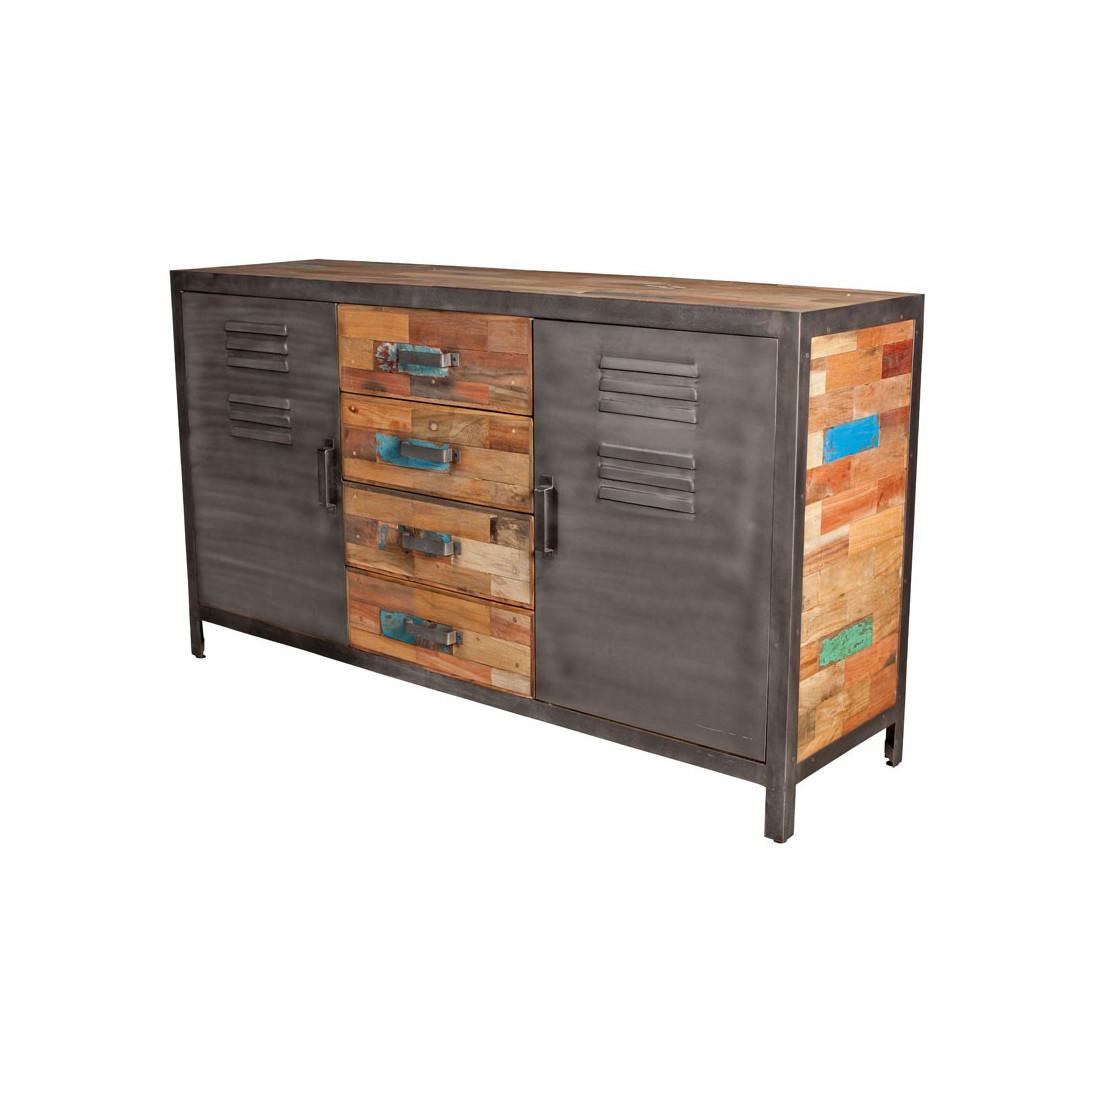 buffet 2 portes 4 tiroirs bois fer fabrik n 1 univers salle manger. Black Bedroom Furniture Sets. Home Design Ideas